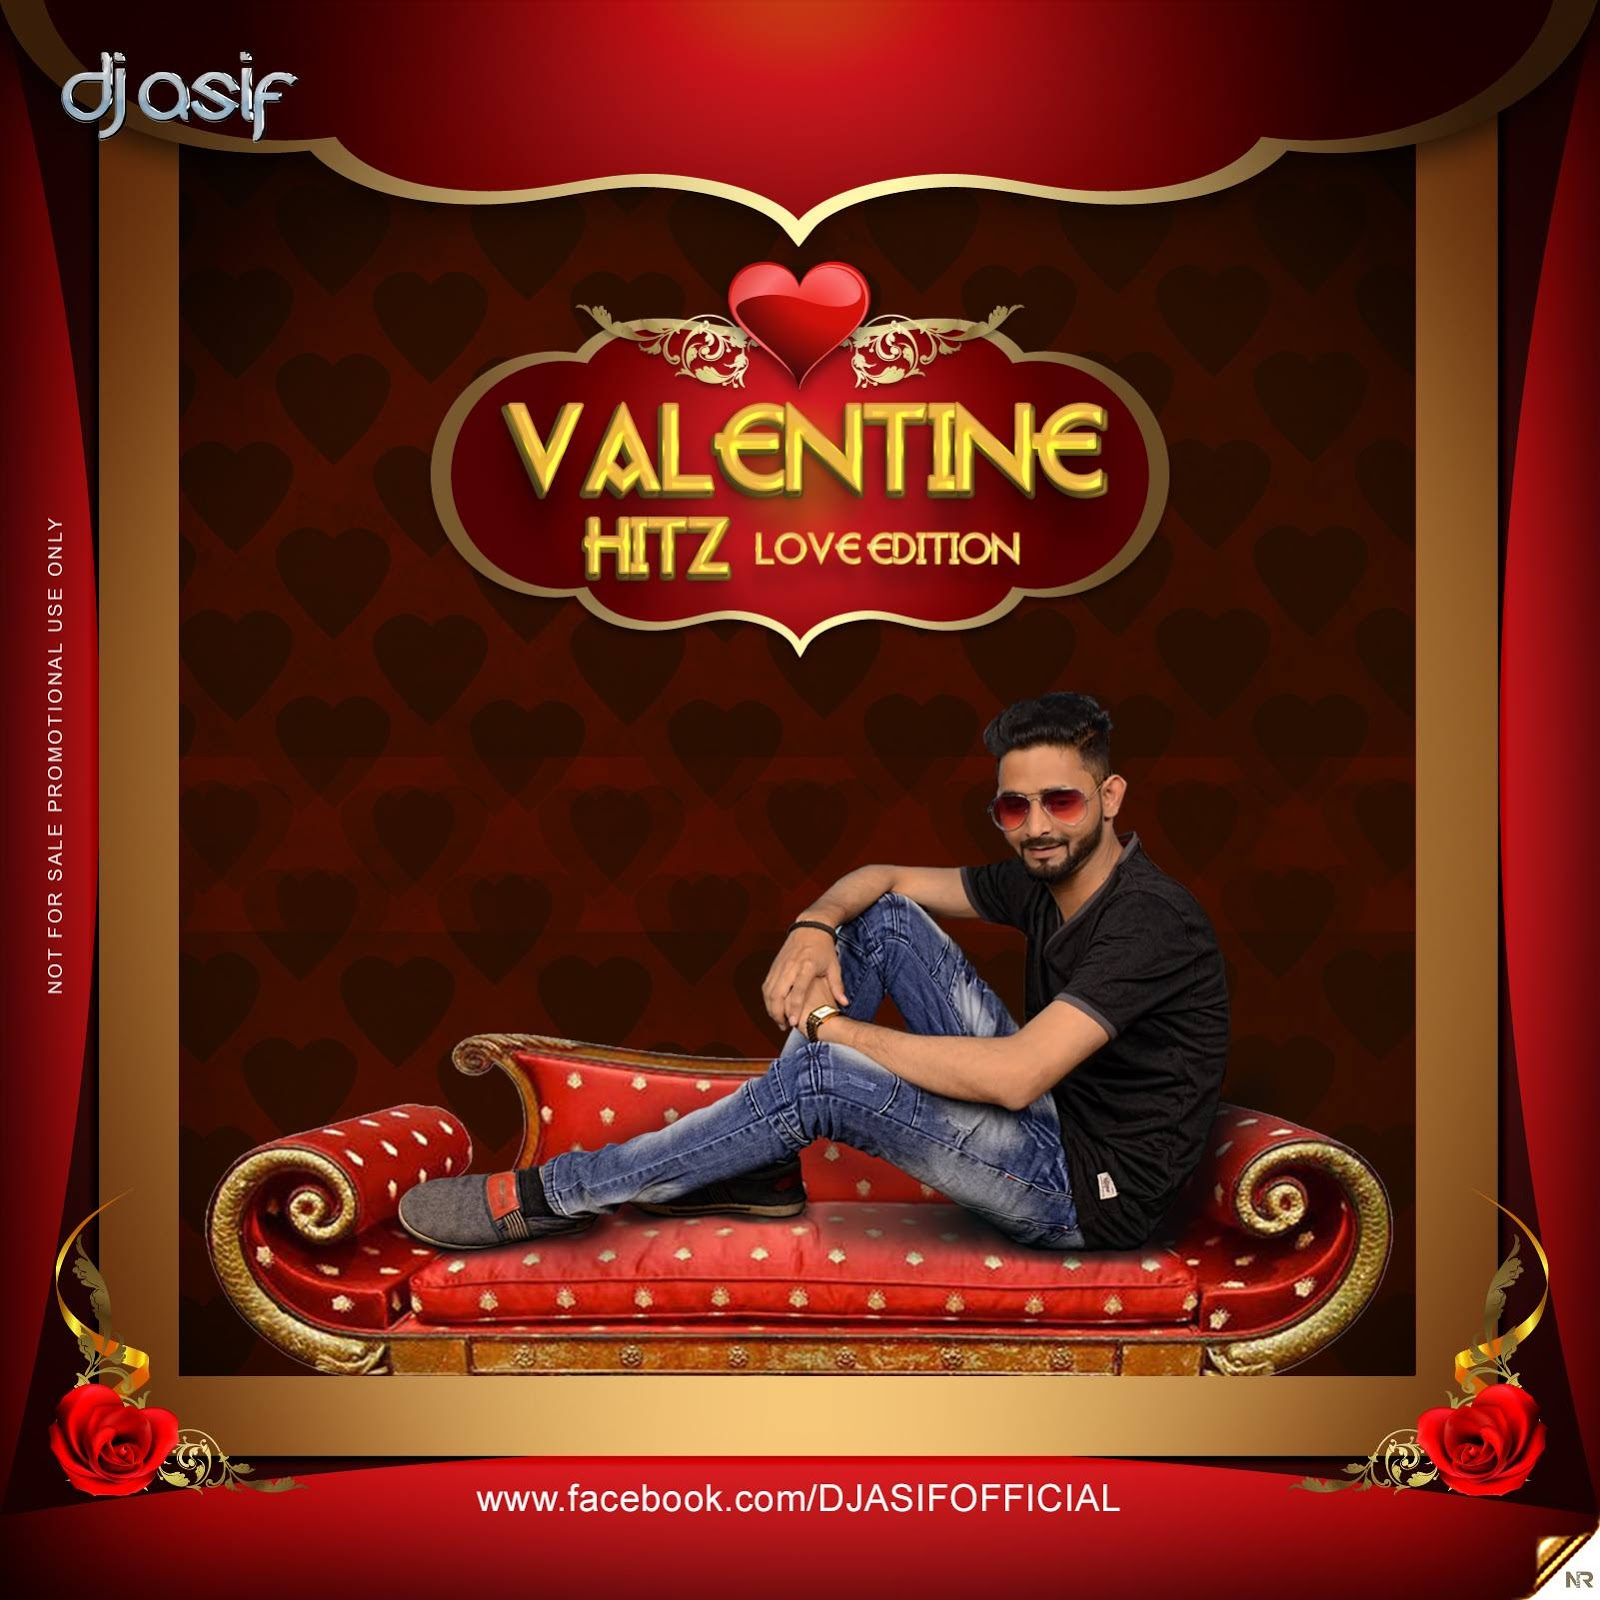 Bhagwa Rang Dj: Valentine Hitz 2017 (Love Edition) DJ Asif